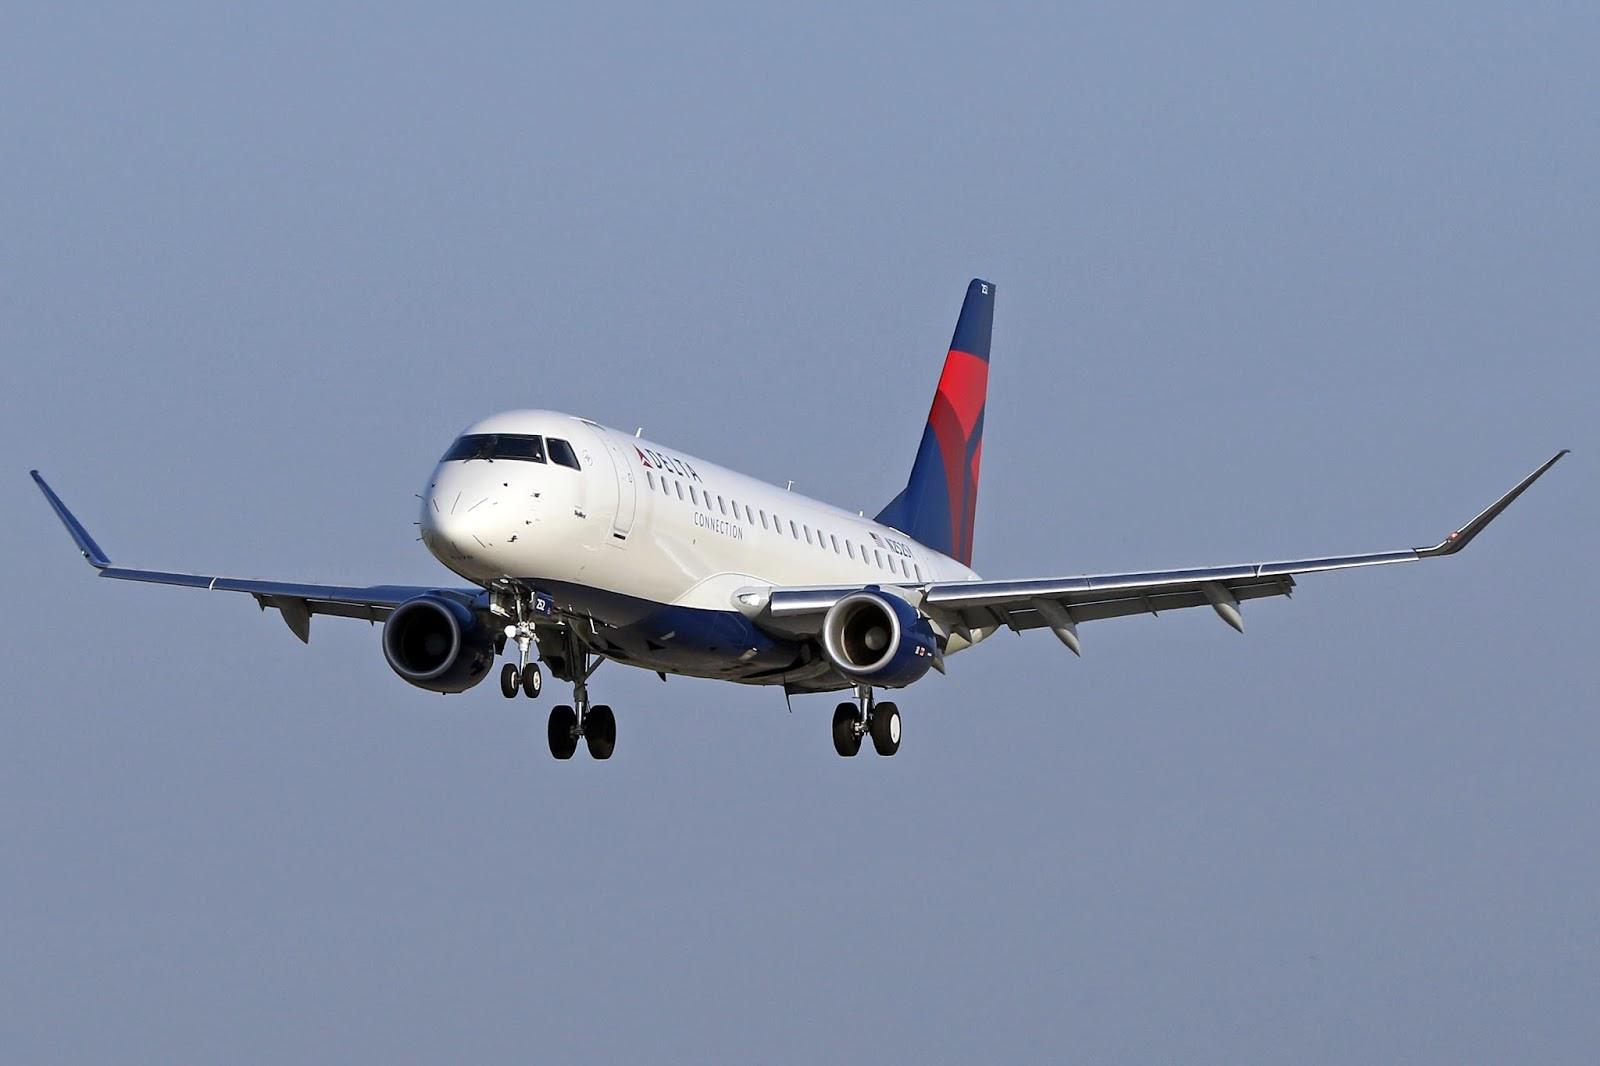 Aero Pacific Flightlines: Delta Connection (SkyWest Airlines